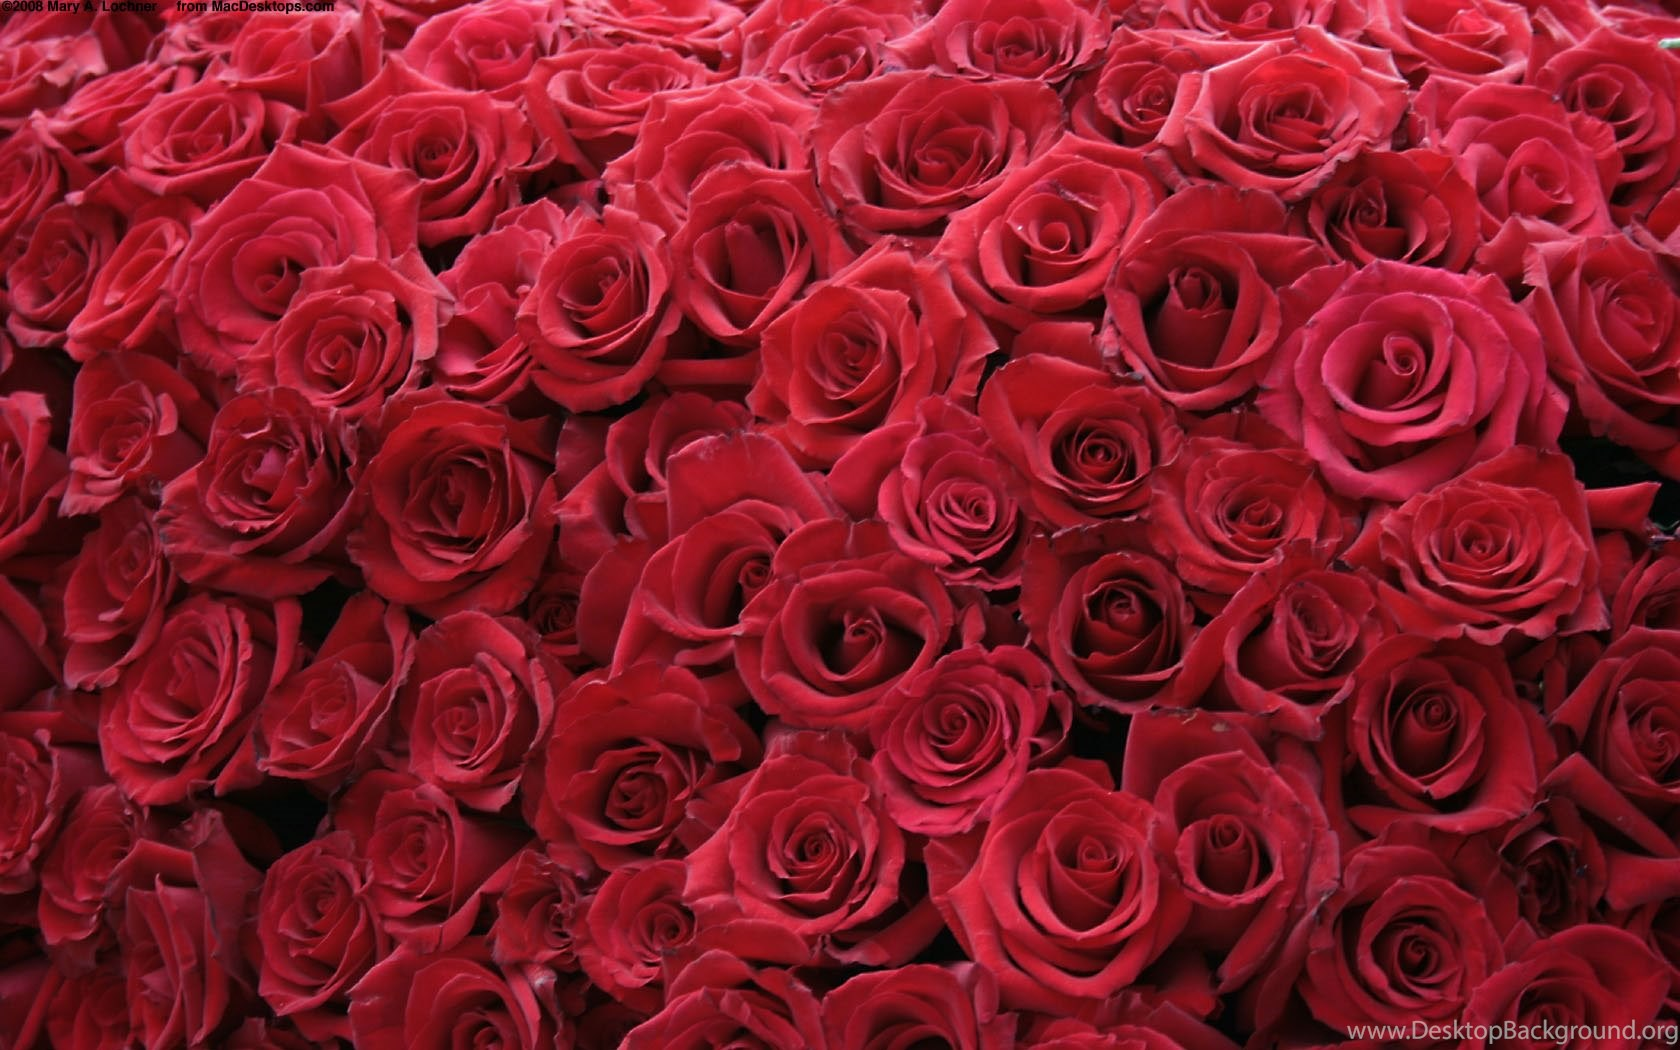 Red Rose Wallpapers Desktop Background